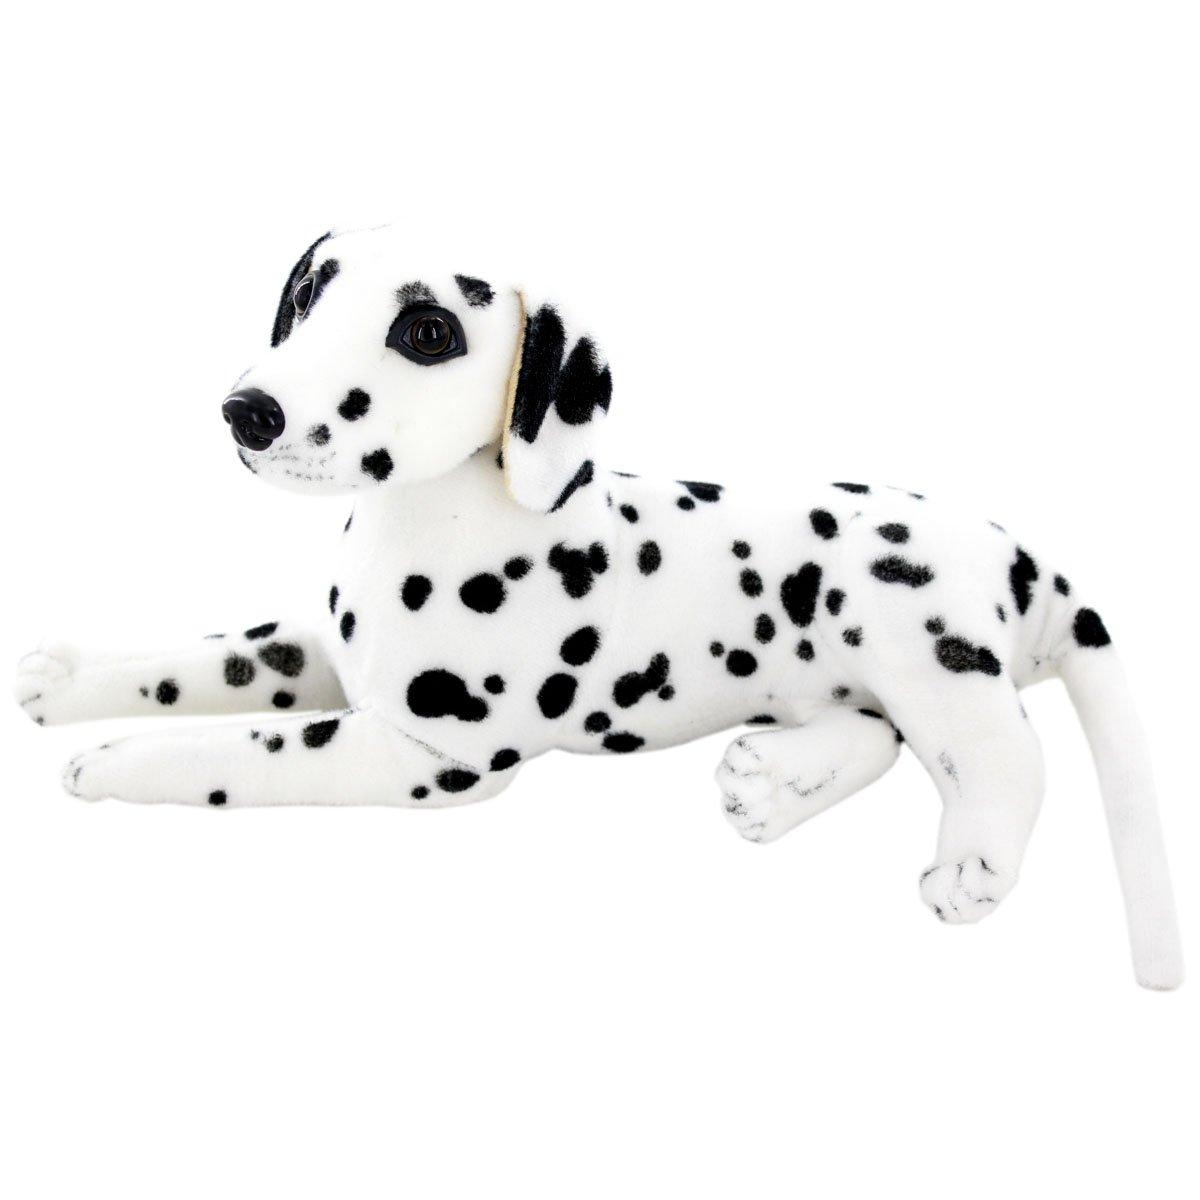 Jesonn Realistic Stuffed Animals Dog Plush Toys Dalmatian,12 or 30CM,1PC by Jesonn